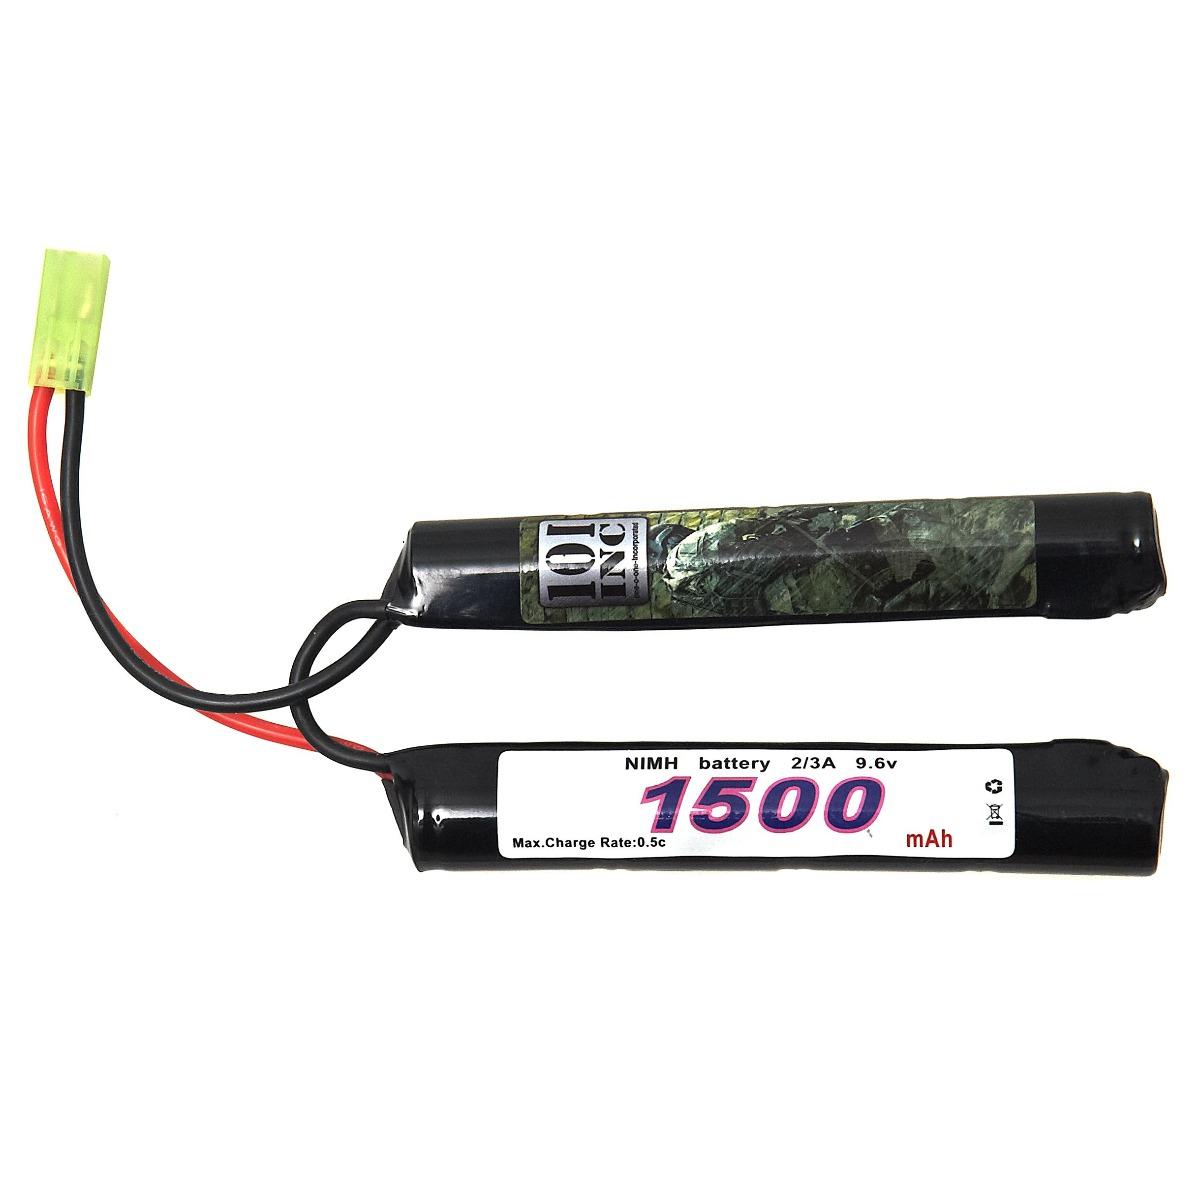 BATTERIJ 101 INC. NIMH 9.6V -1500 MAH BUTTERFLY STICK-0